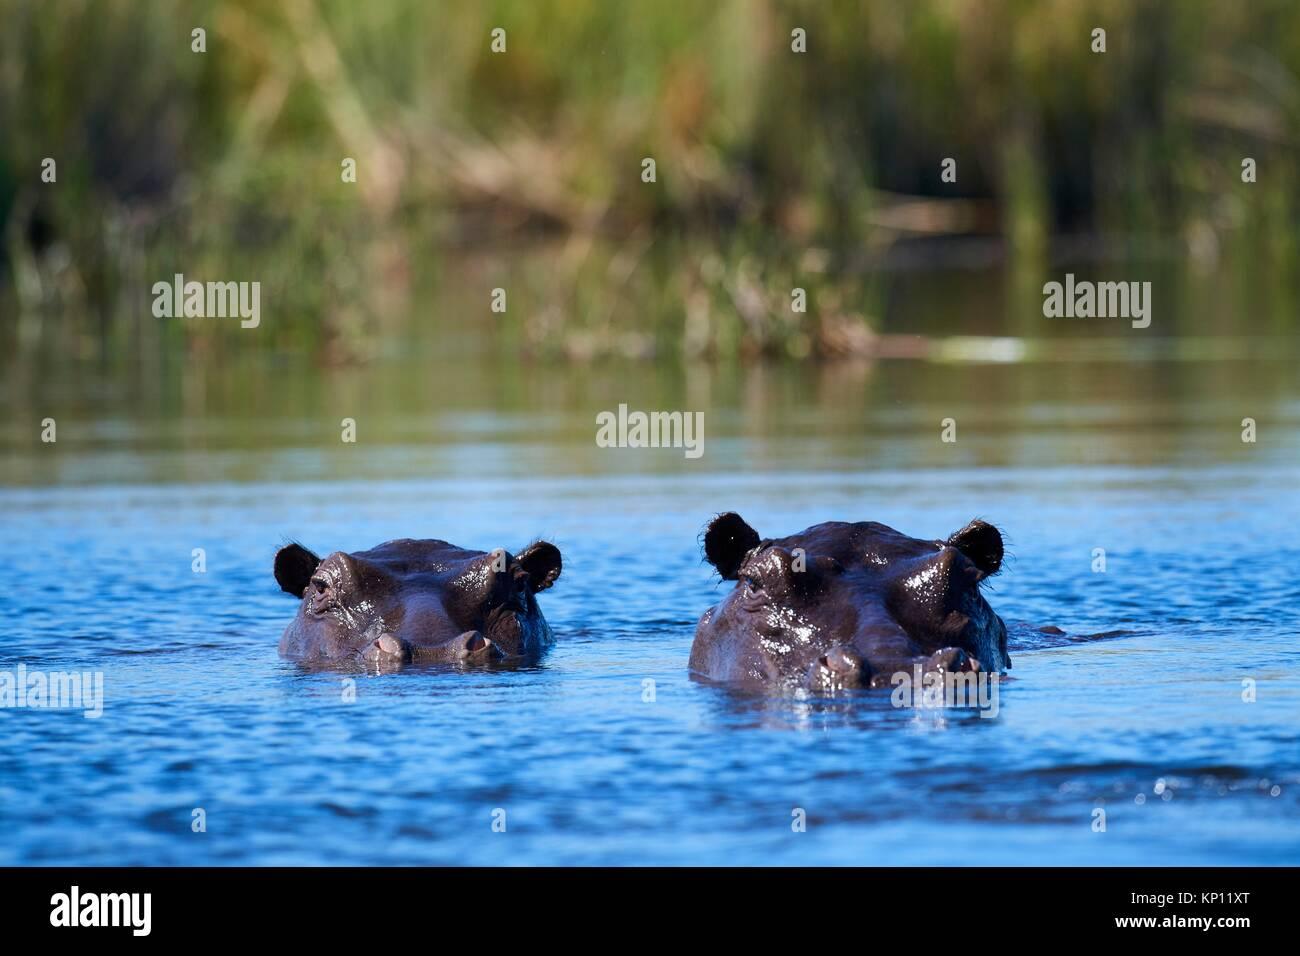 Hippopotamus (Hippopotamus amphibius) submerged in water. Moremi National Park, Okavango delta, Botswana, Southern - Stock Image